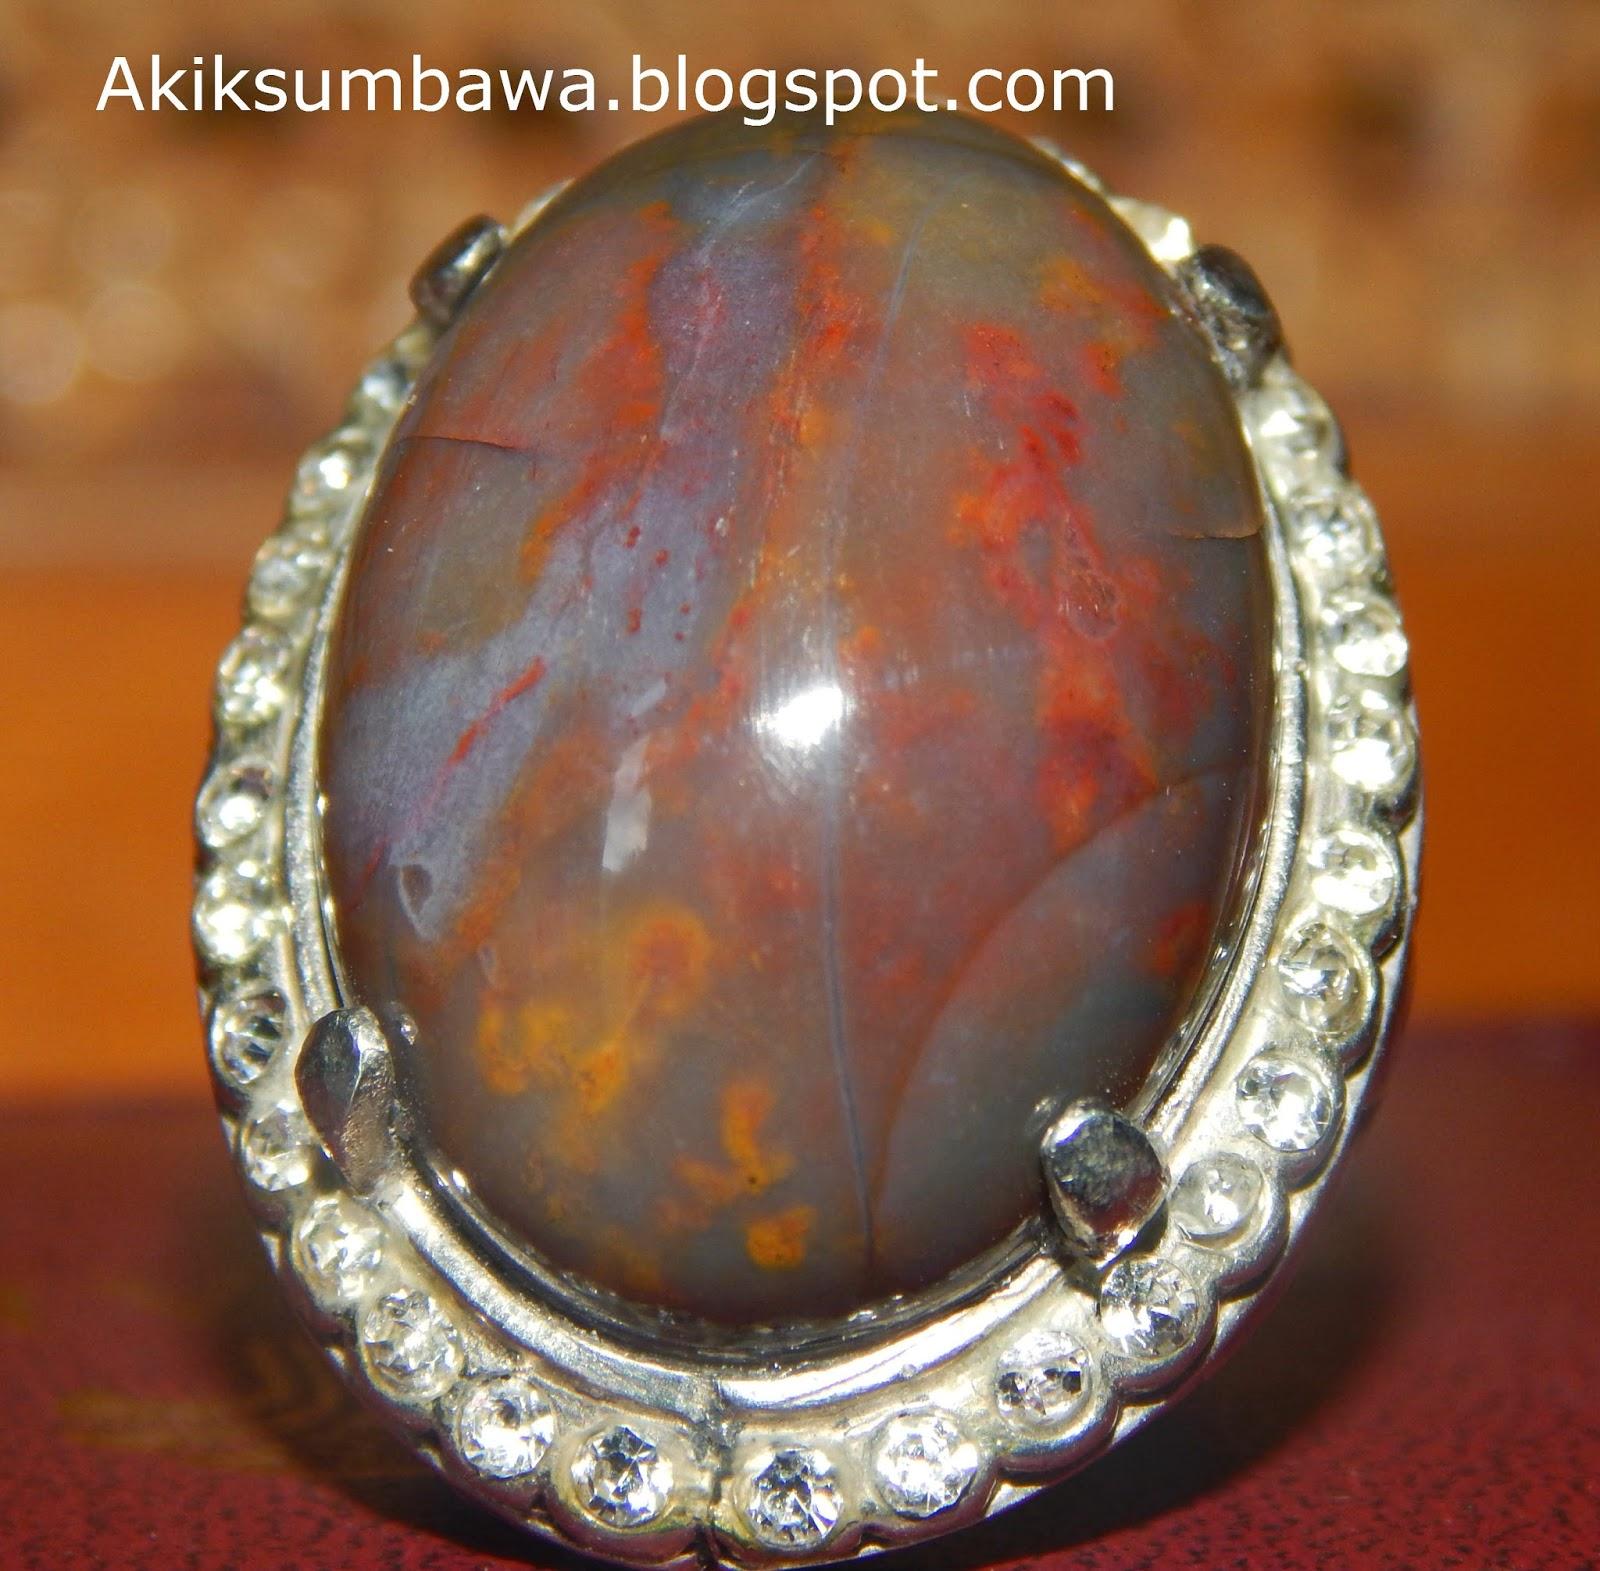 Batu Akik Panca Warna Sumbawa